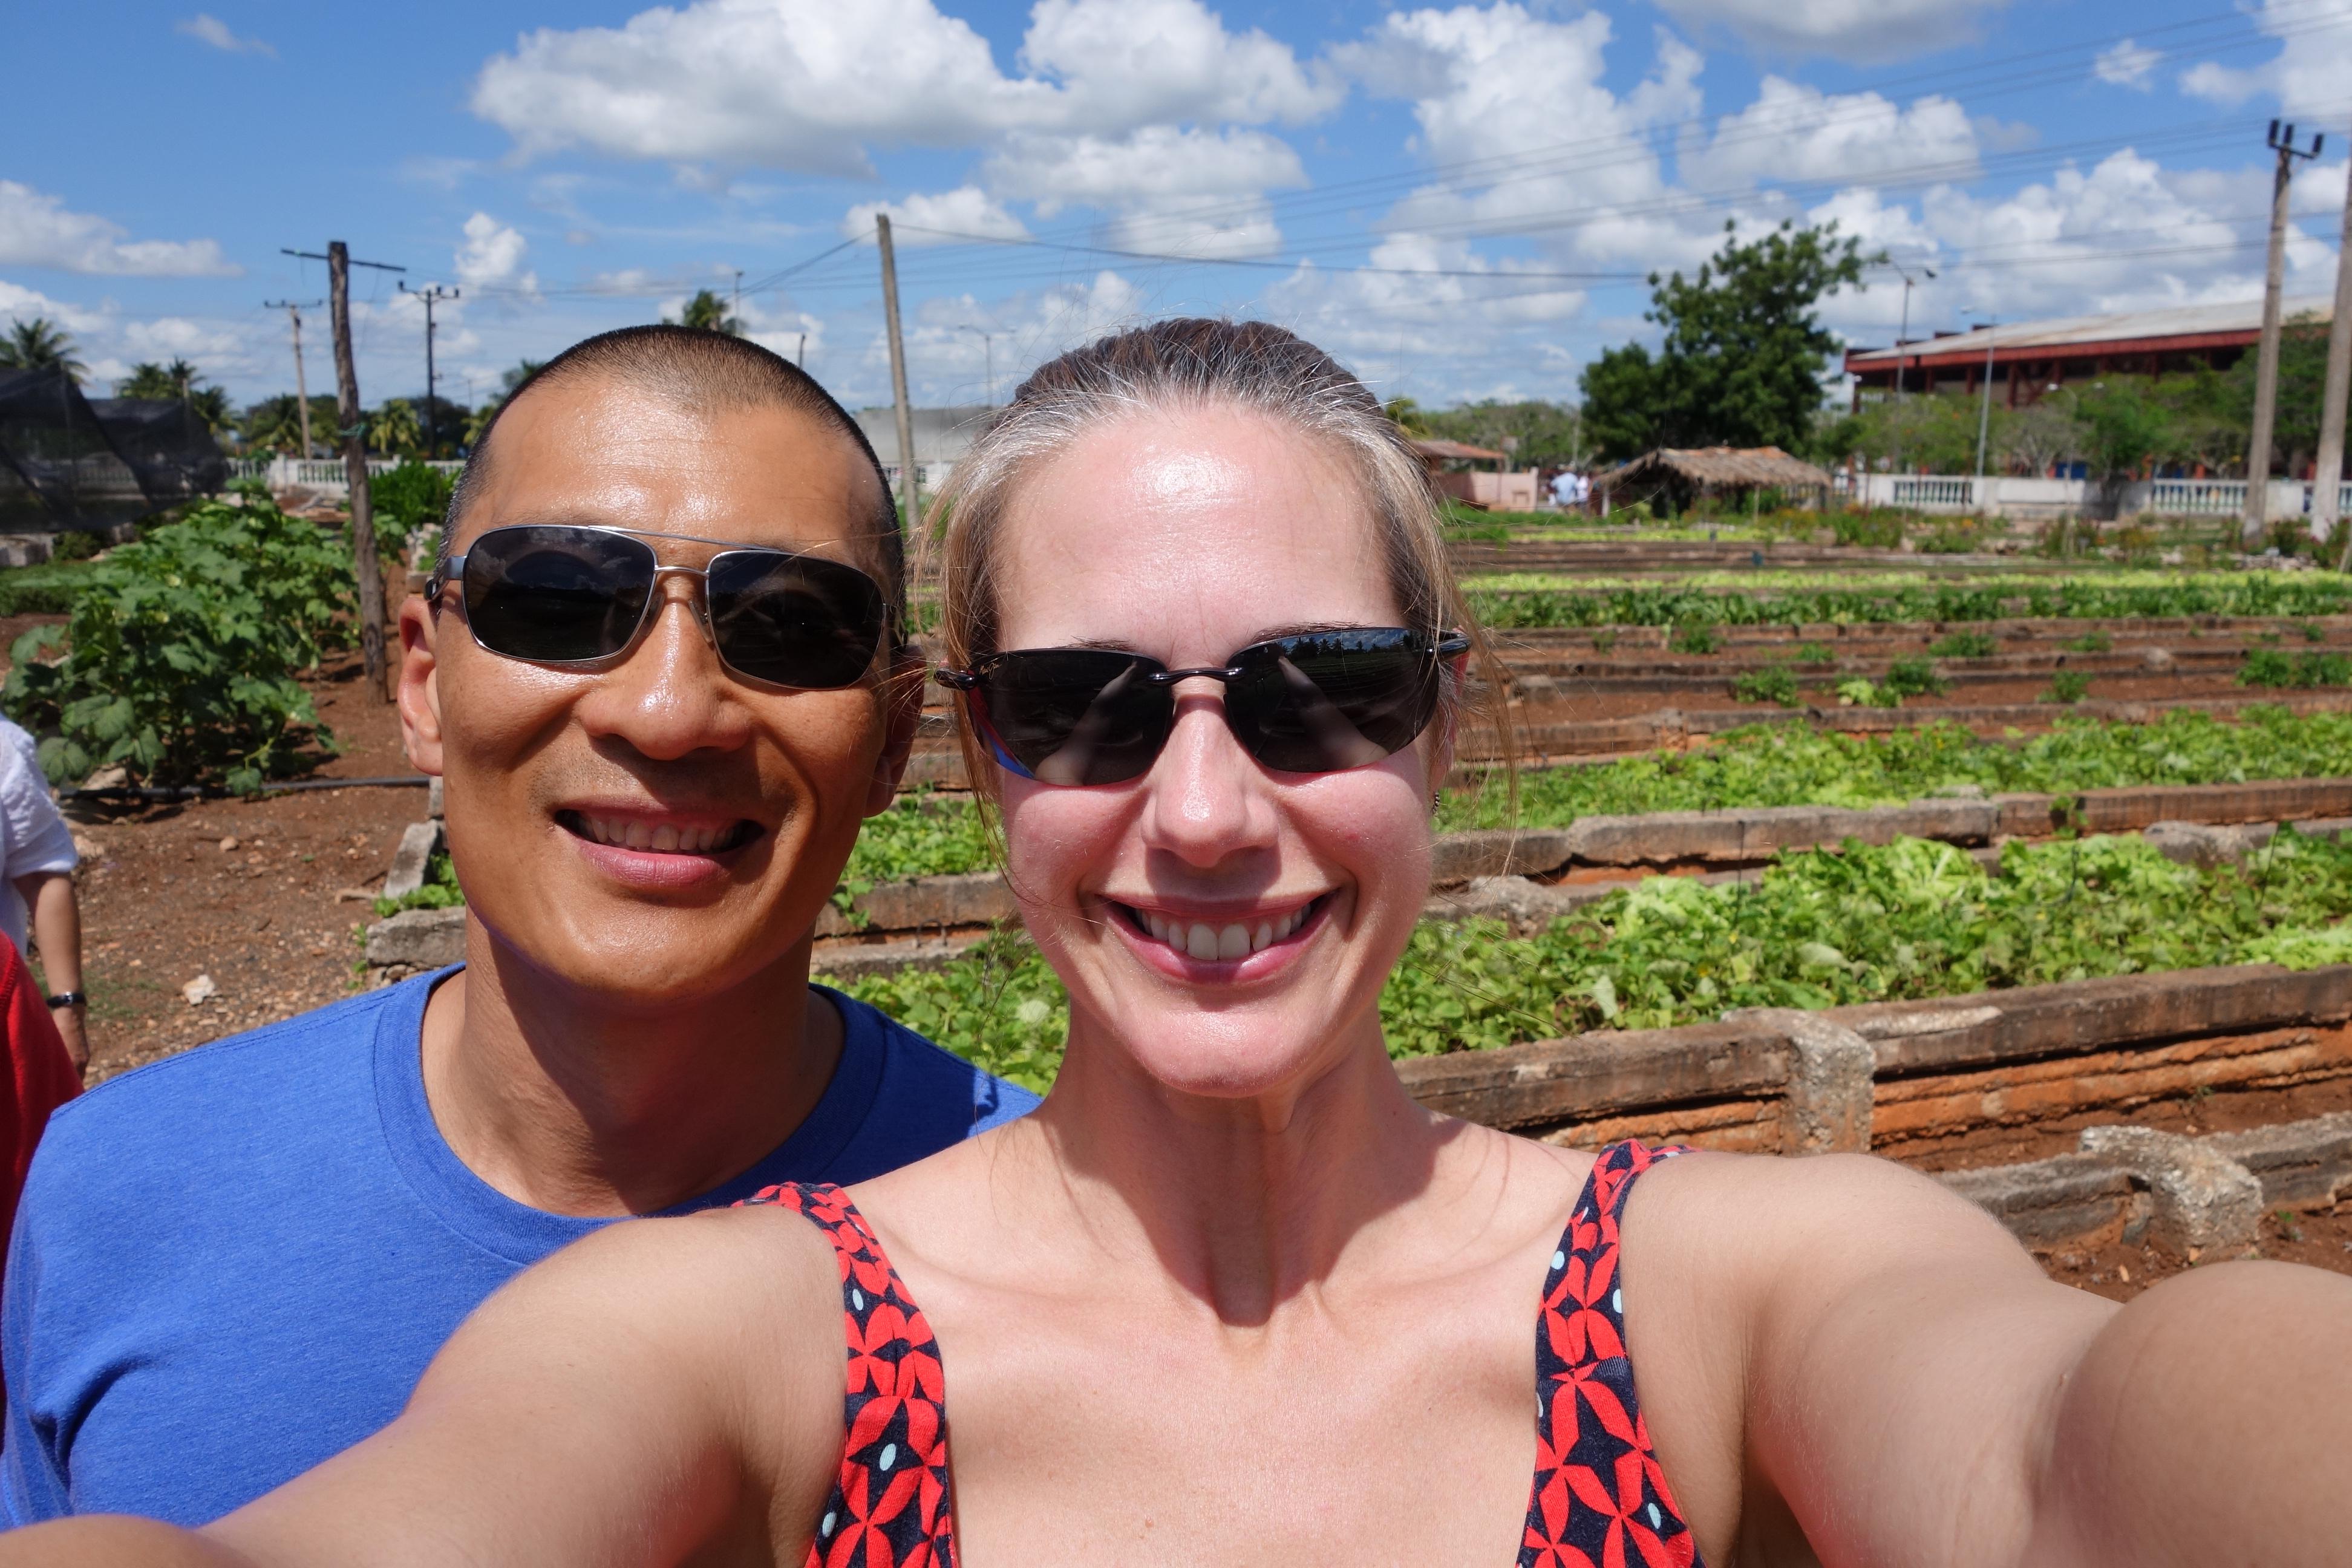 05.26 Daily Selfie Garden